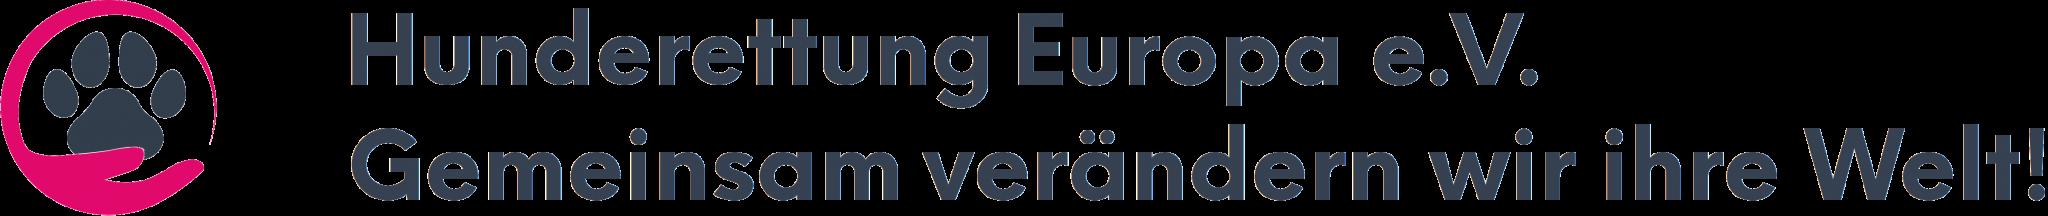 Hunderettung Europa